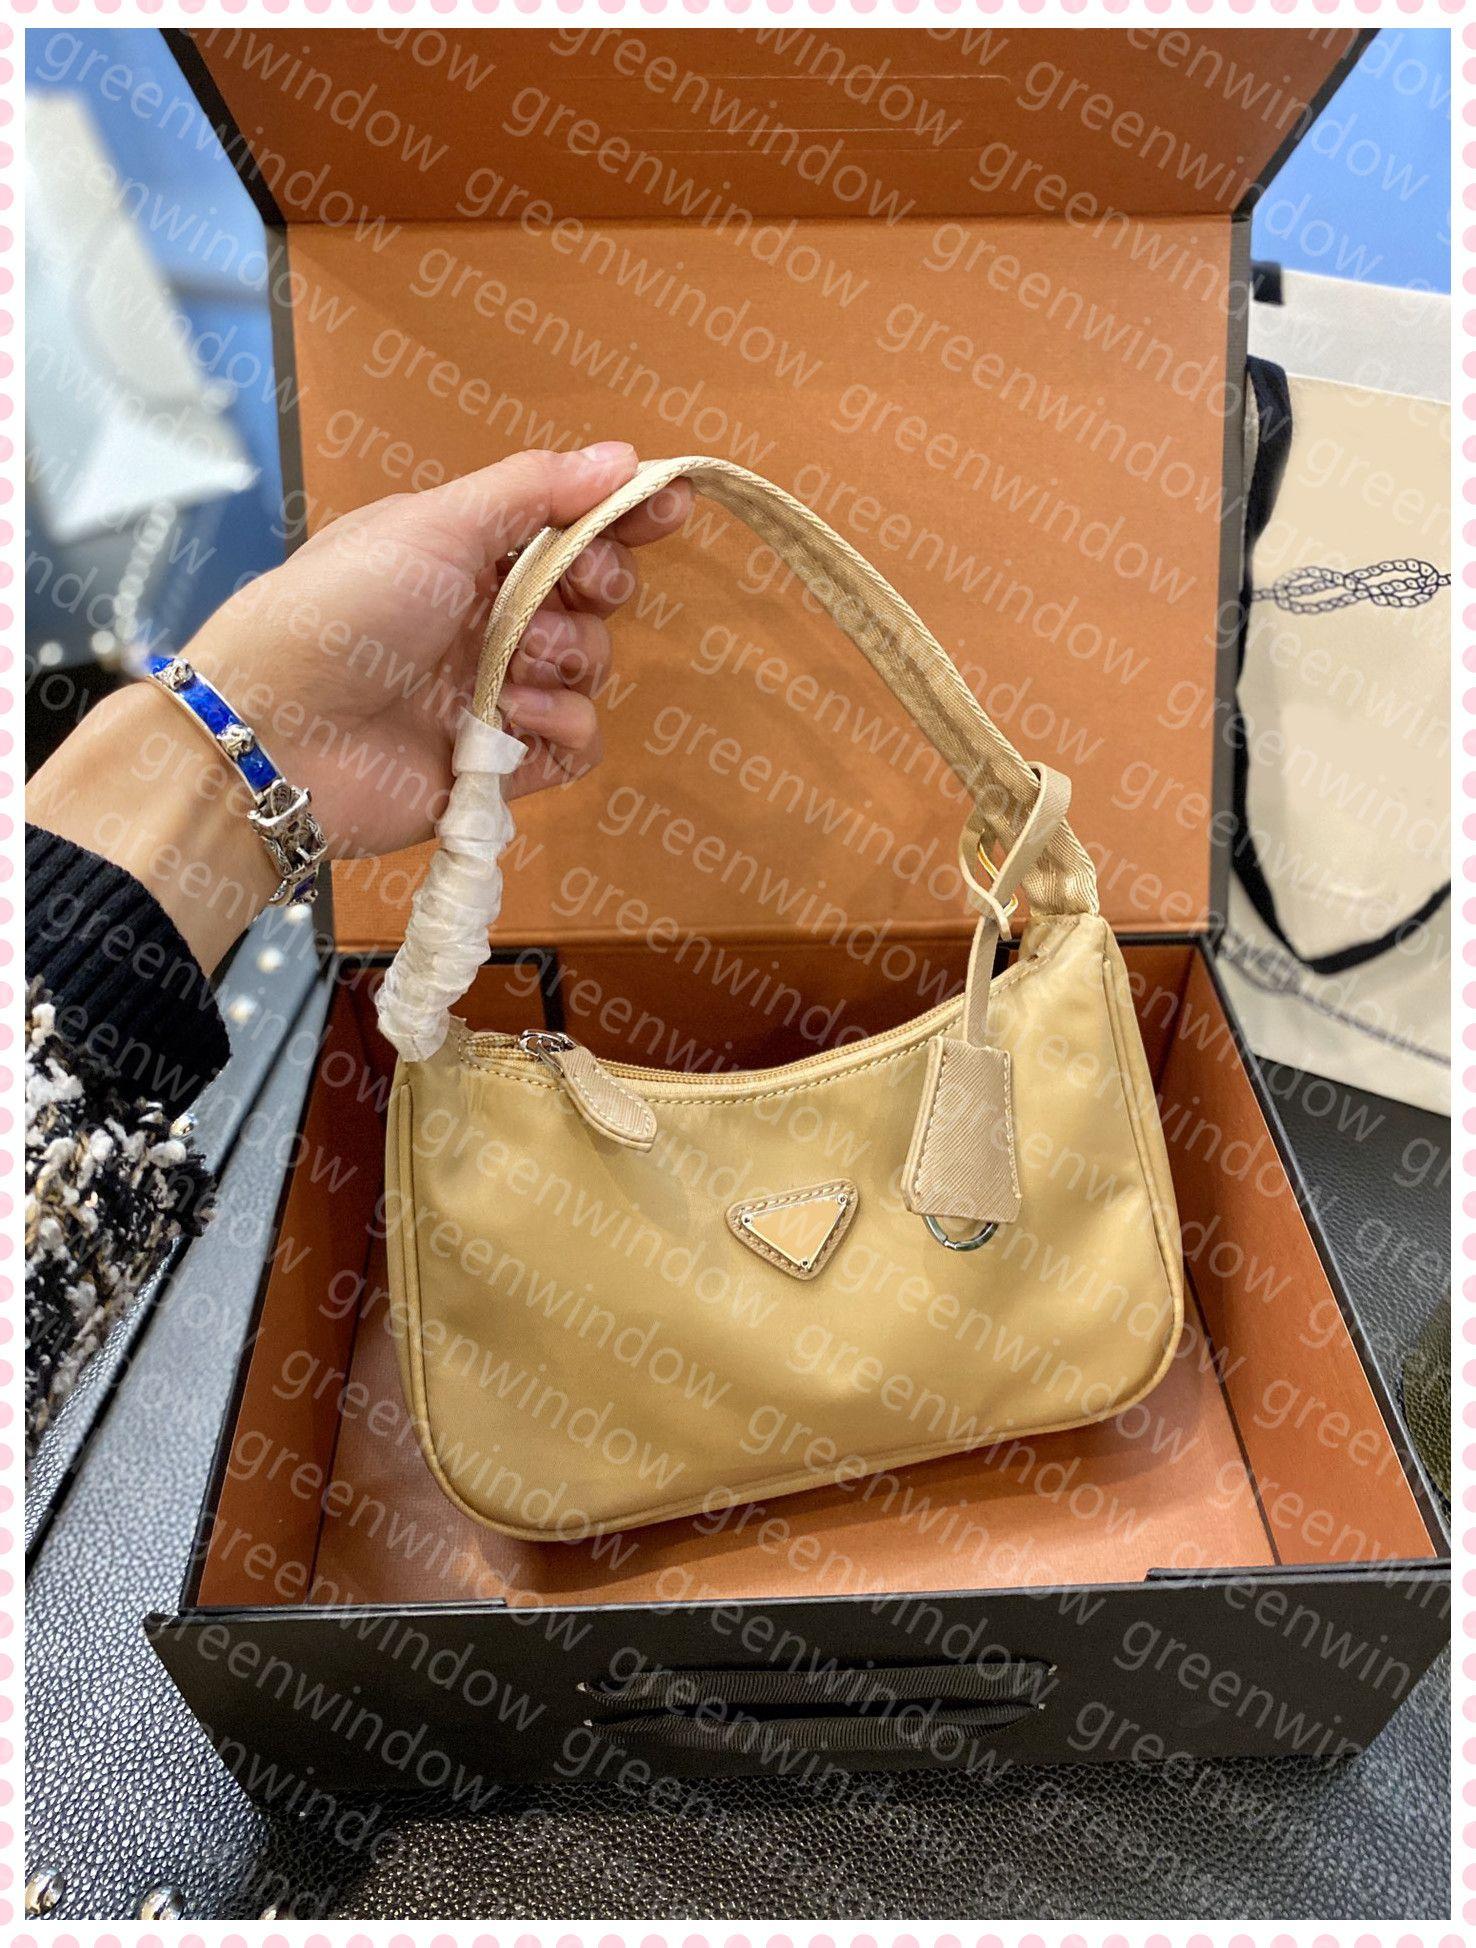 Bolsas Luxurys Designers Mini Messenger Crossbody DQ Moda Bags Pochette Bag Ombro Saco Mulheres Bolsa Mulheres Hobo 2021 21030912 KXWL